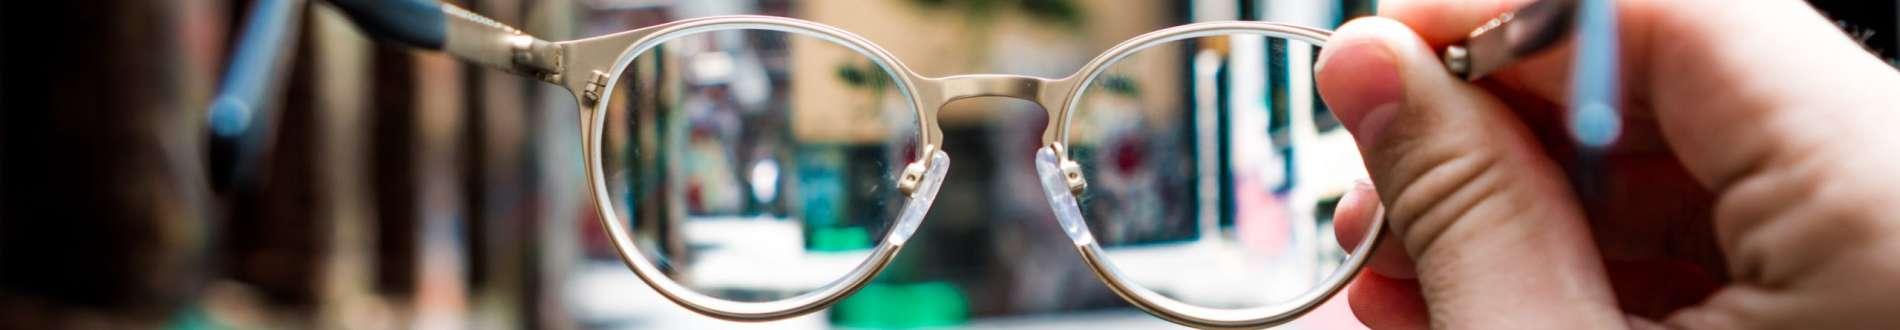 Eye glasses that help see a city street